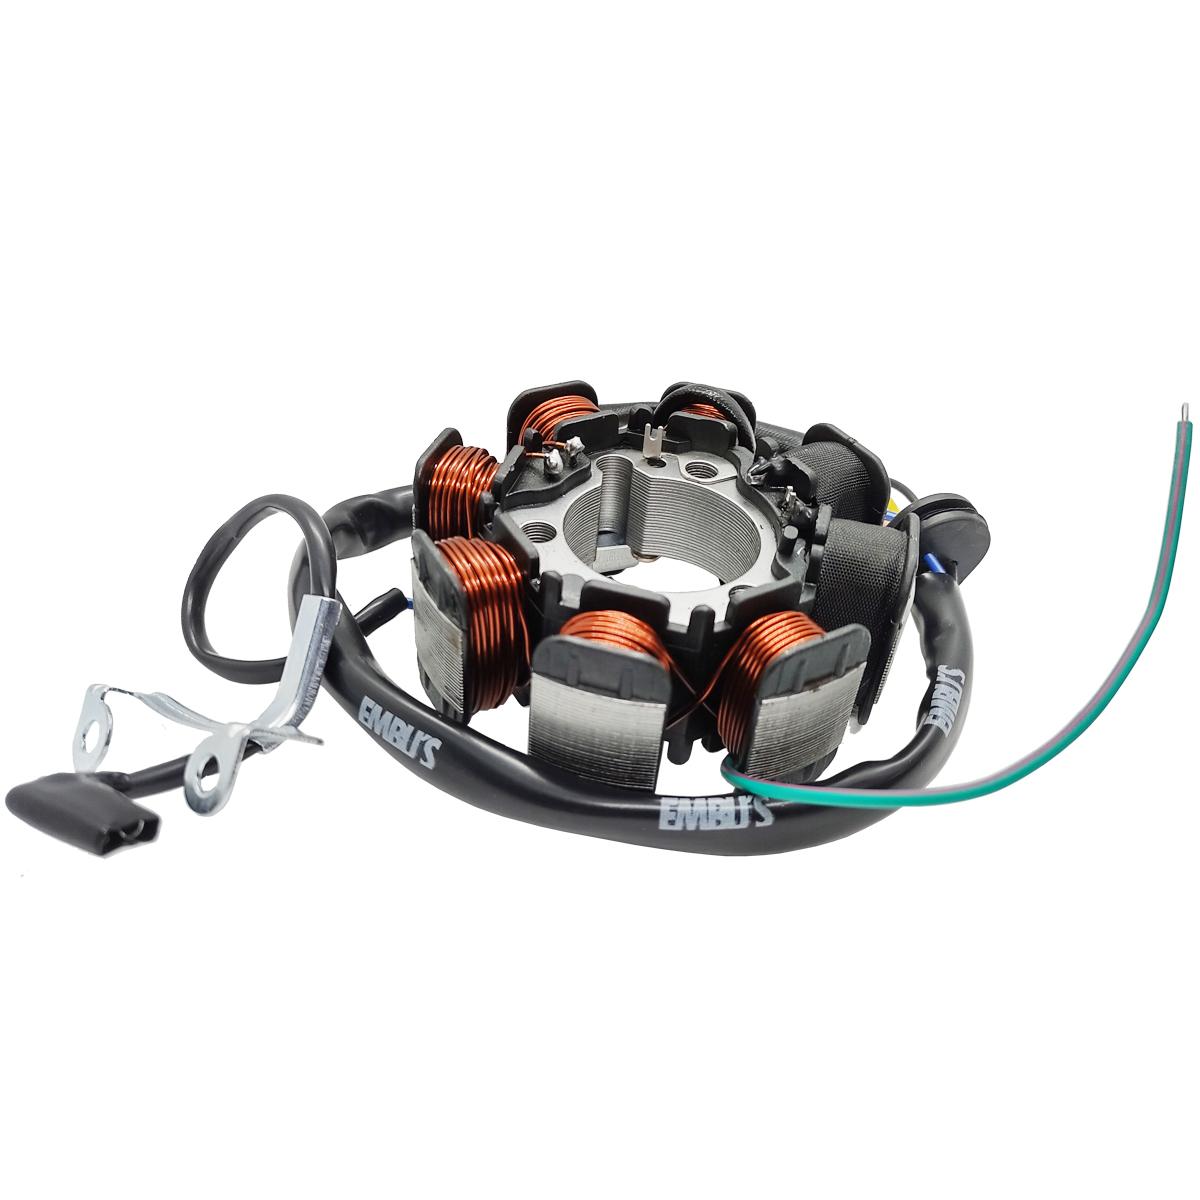 Estator Magneto XR / NX / CBX 200 STRADA / NX / CBX 150